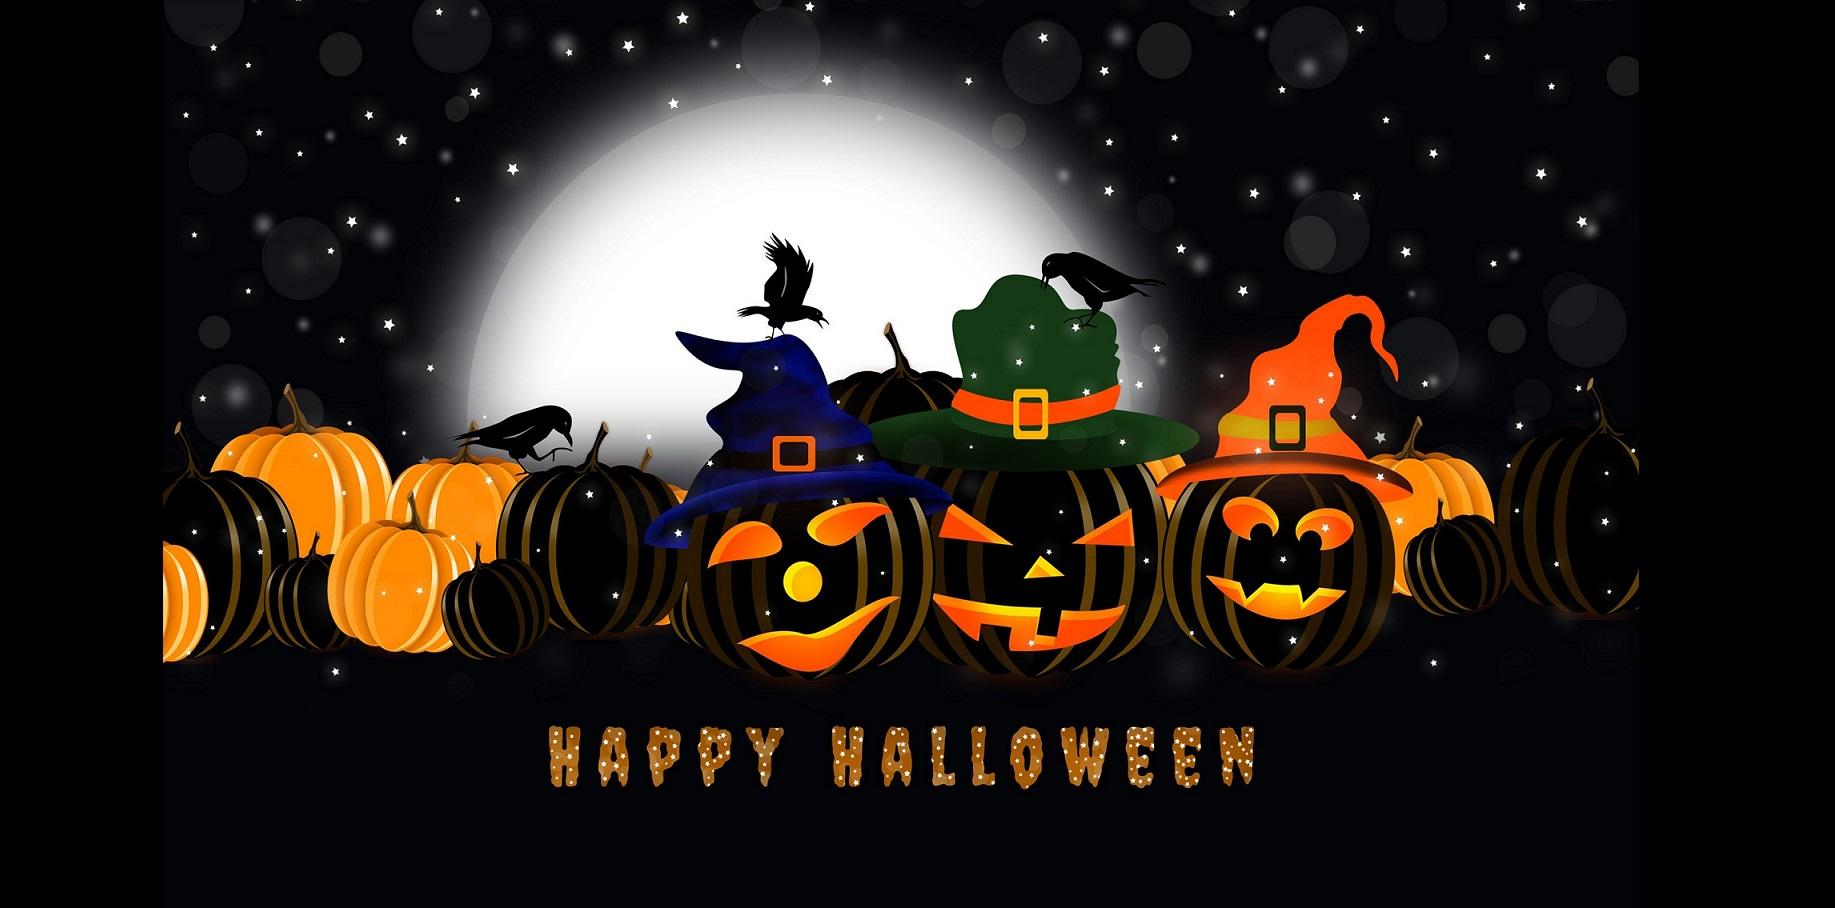 Goodbye October! Happy Halloween!